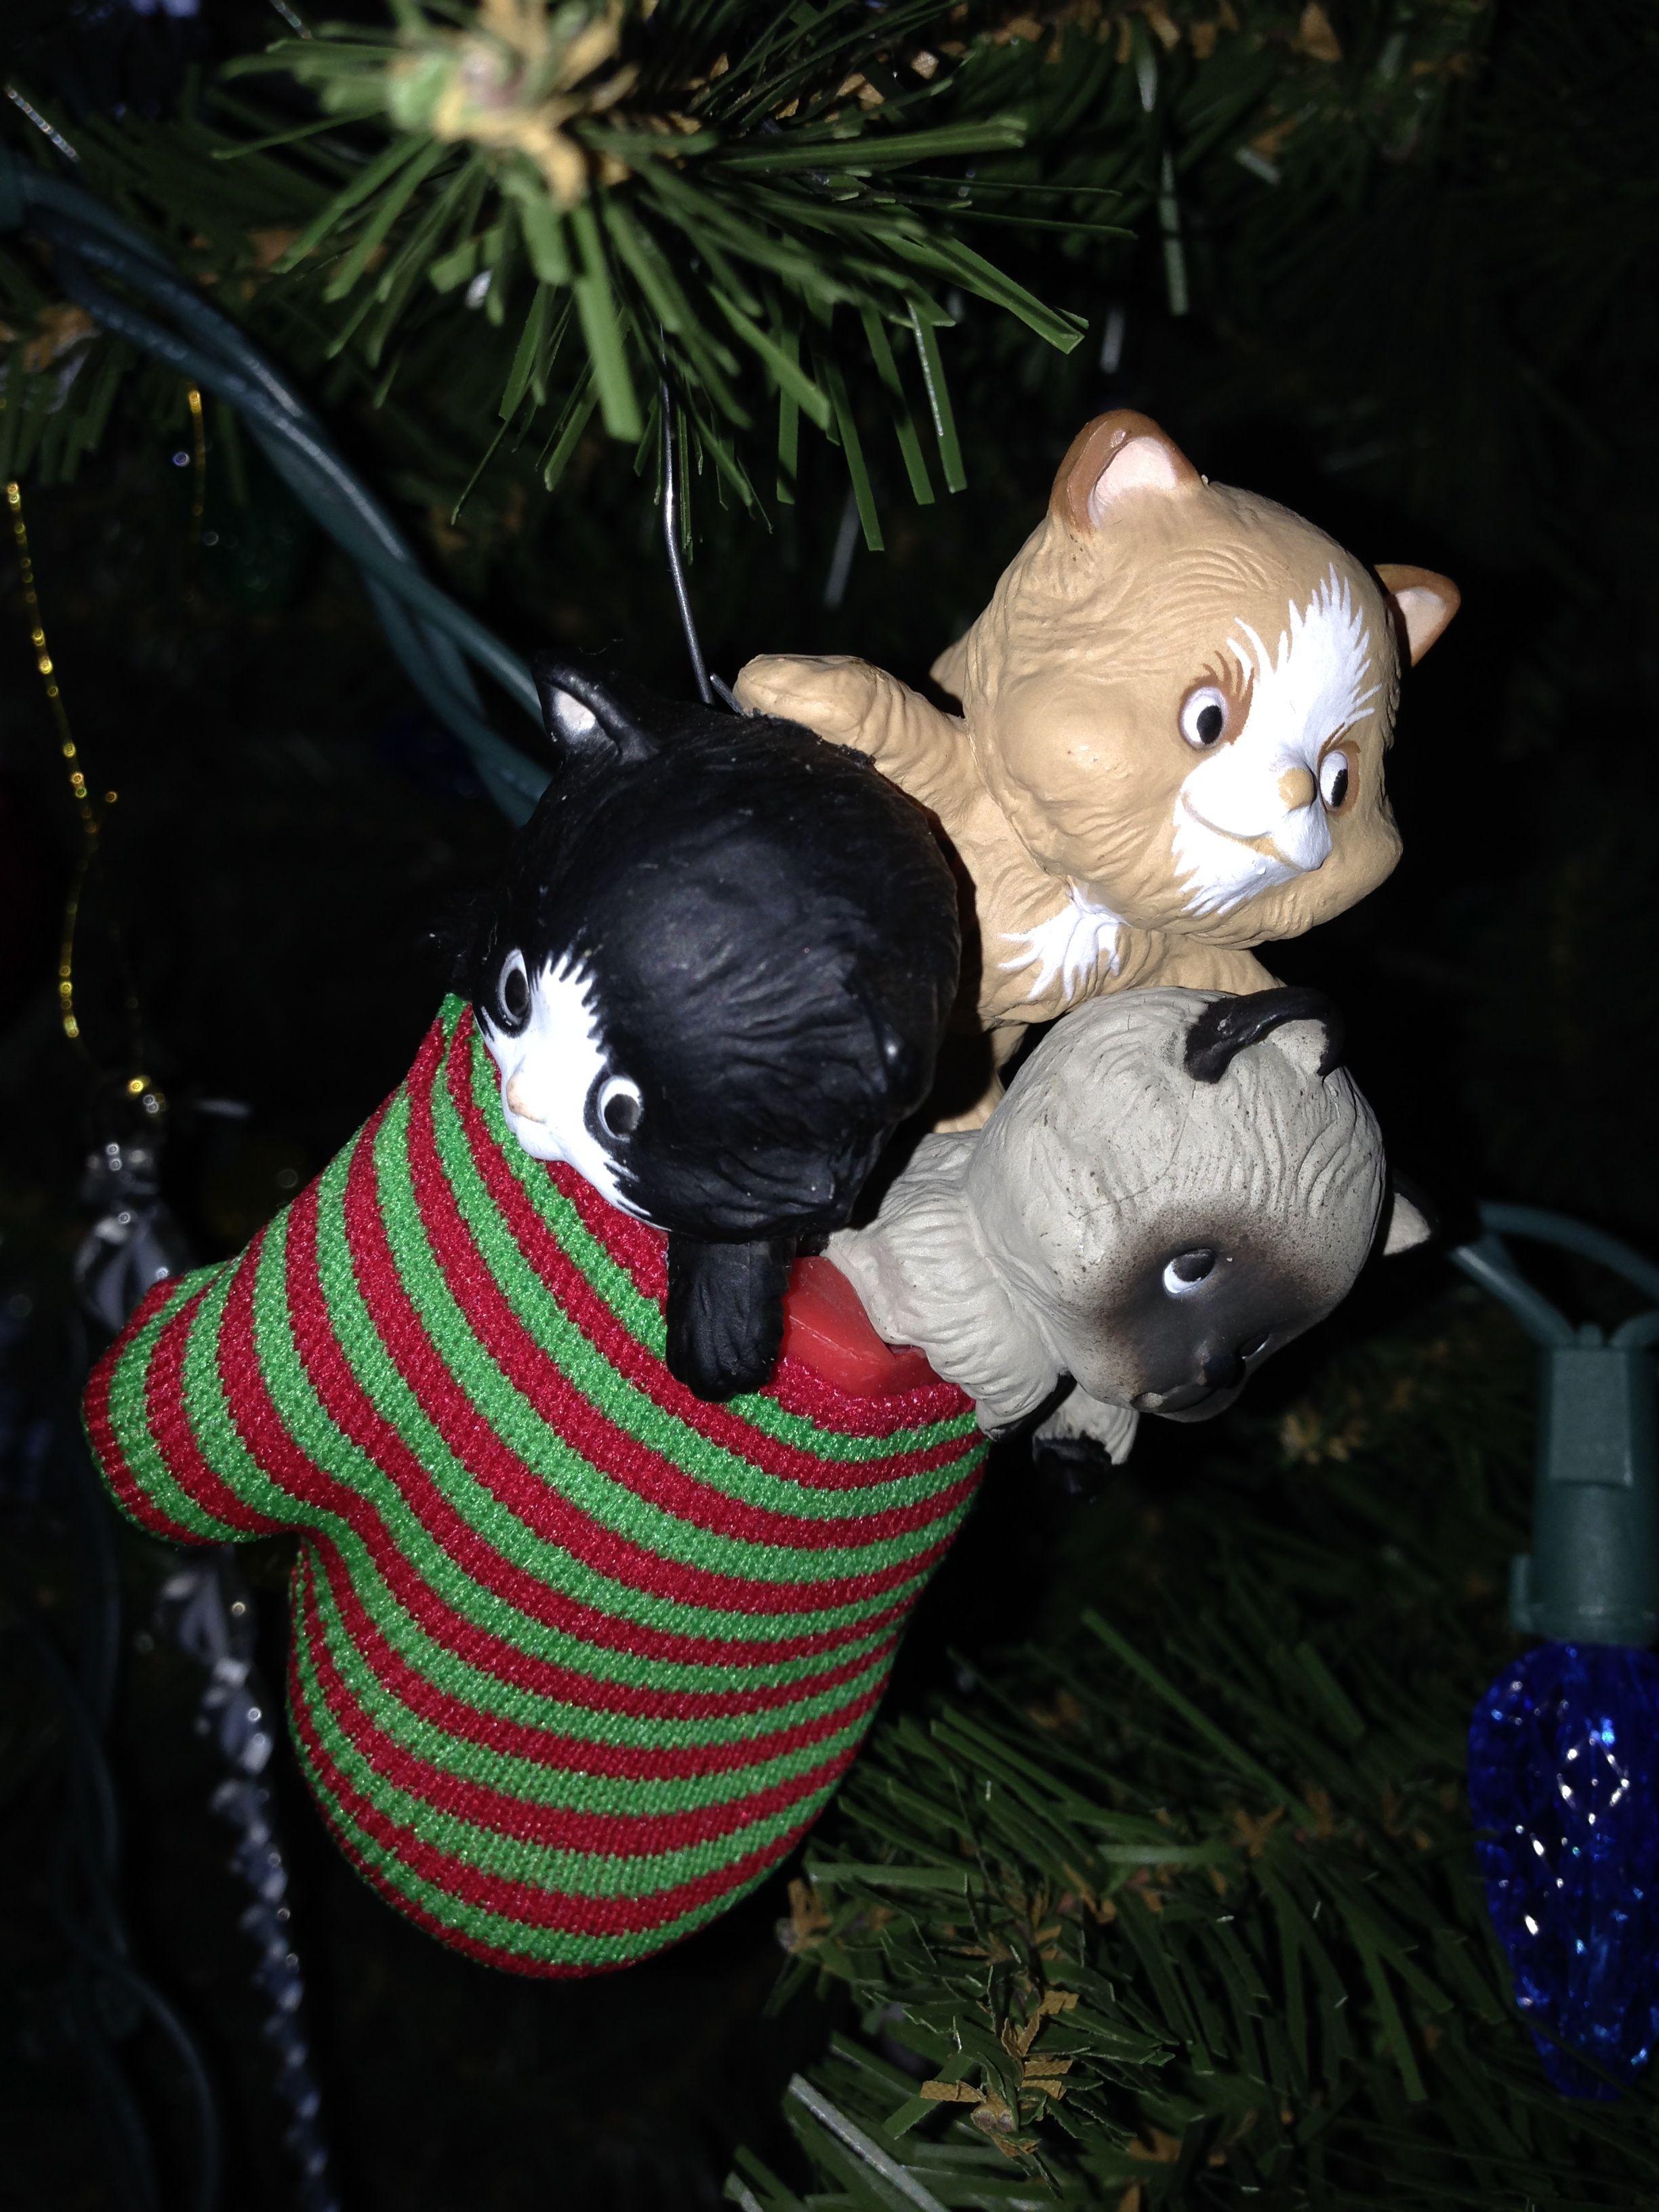 Three Kittens In A Mitten Ornament 1984 Hallmark Mitten Ornaments Hallmark Ornaments Christmas Ornaments